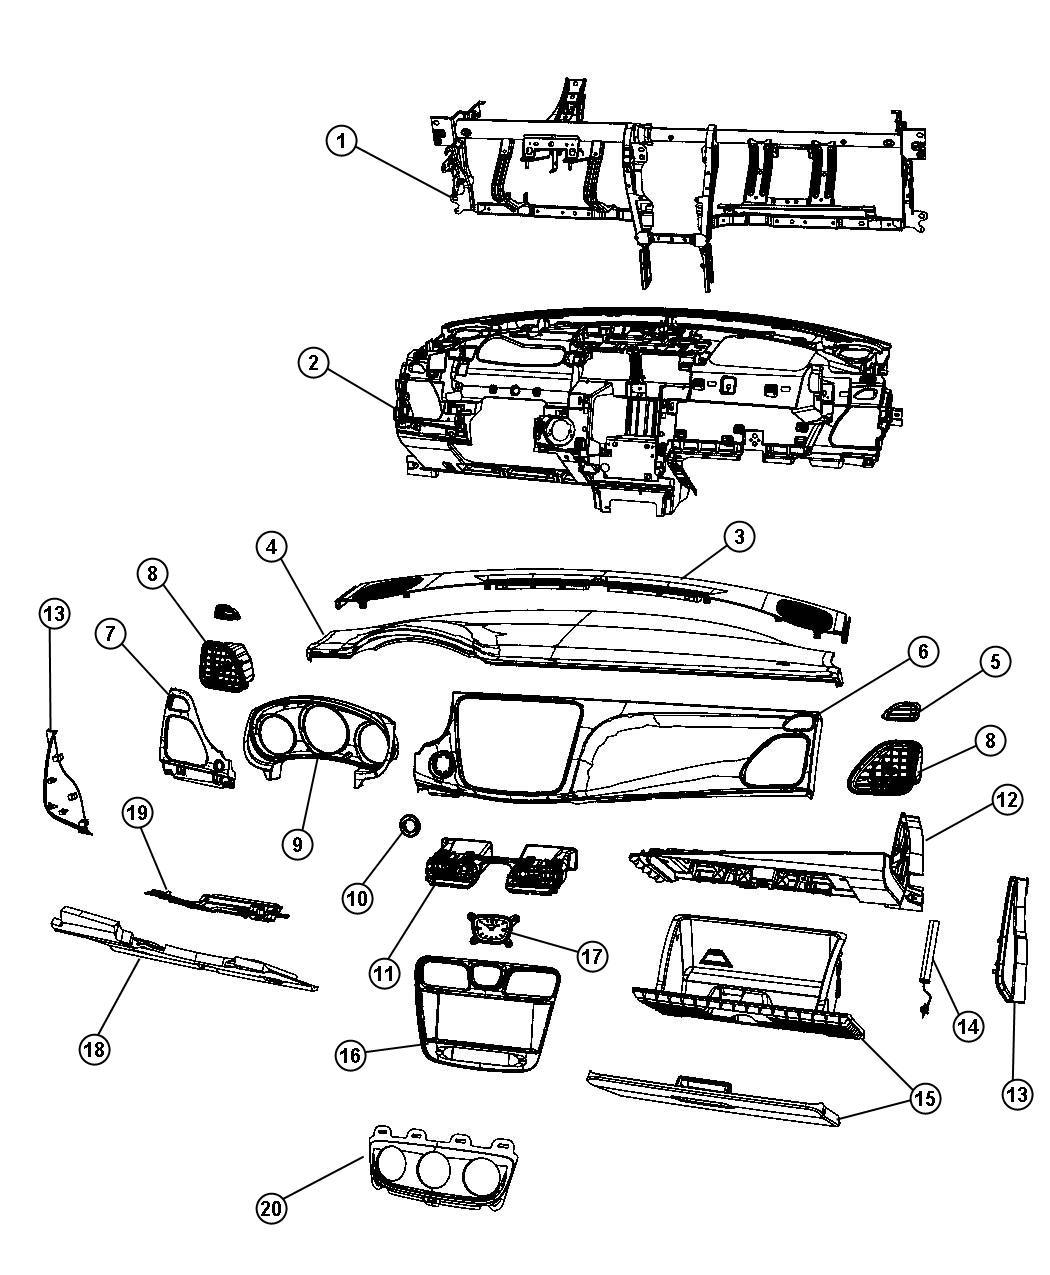 2013 Dodge Avenger Bezel. Instrument cluster. [x9]. Trim